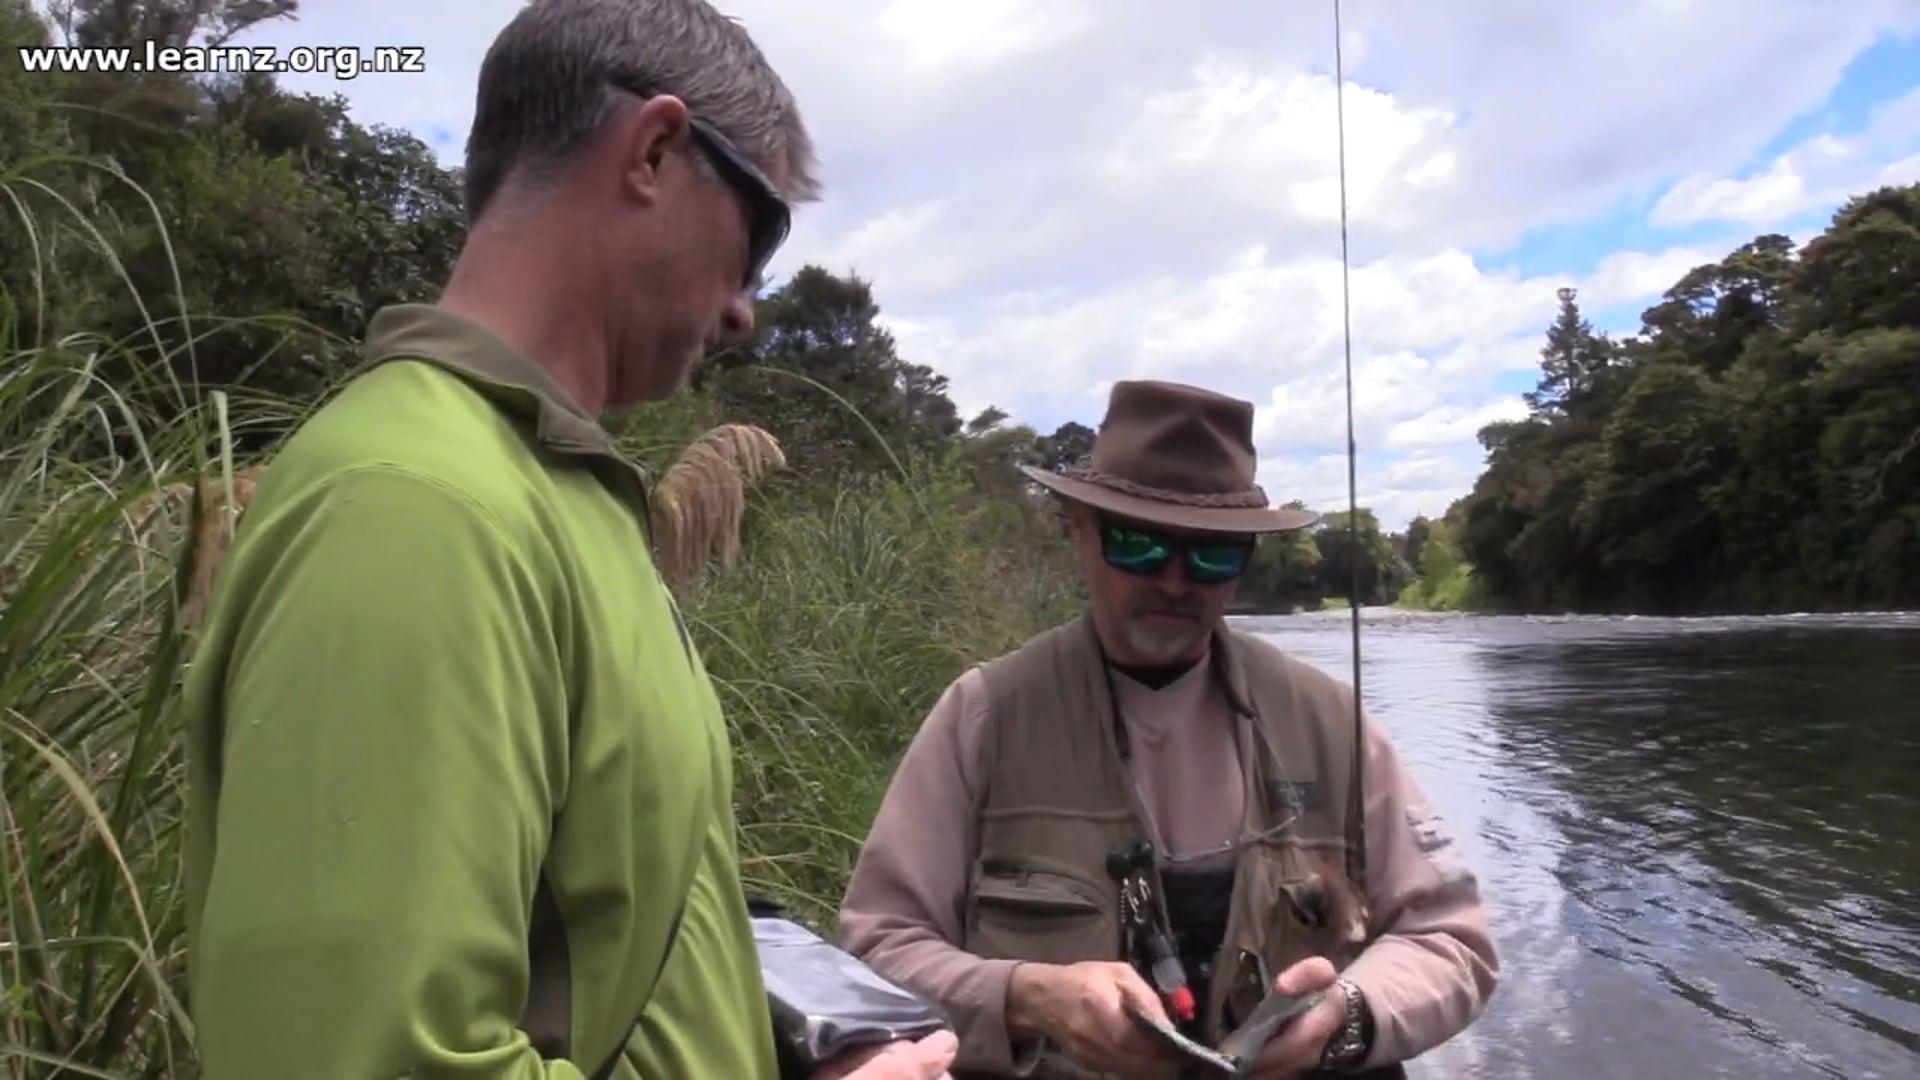 Surveying anglers